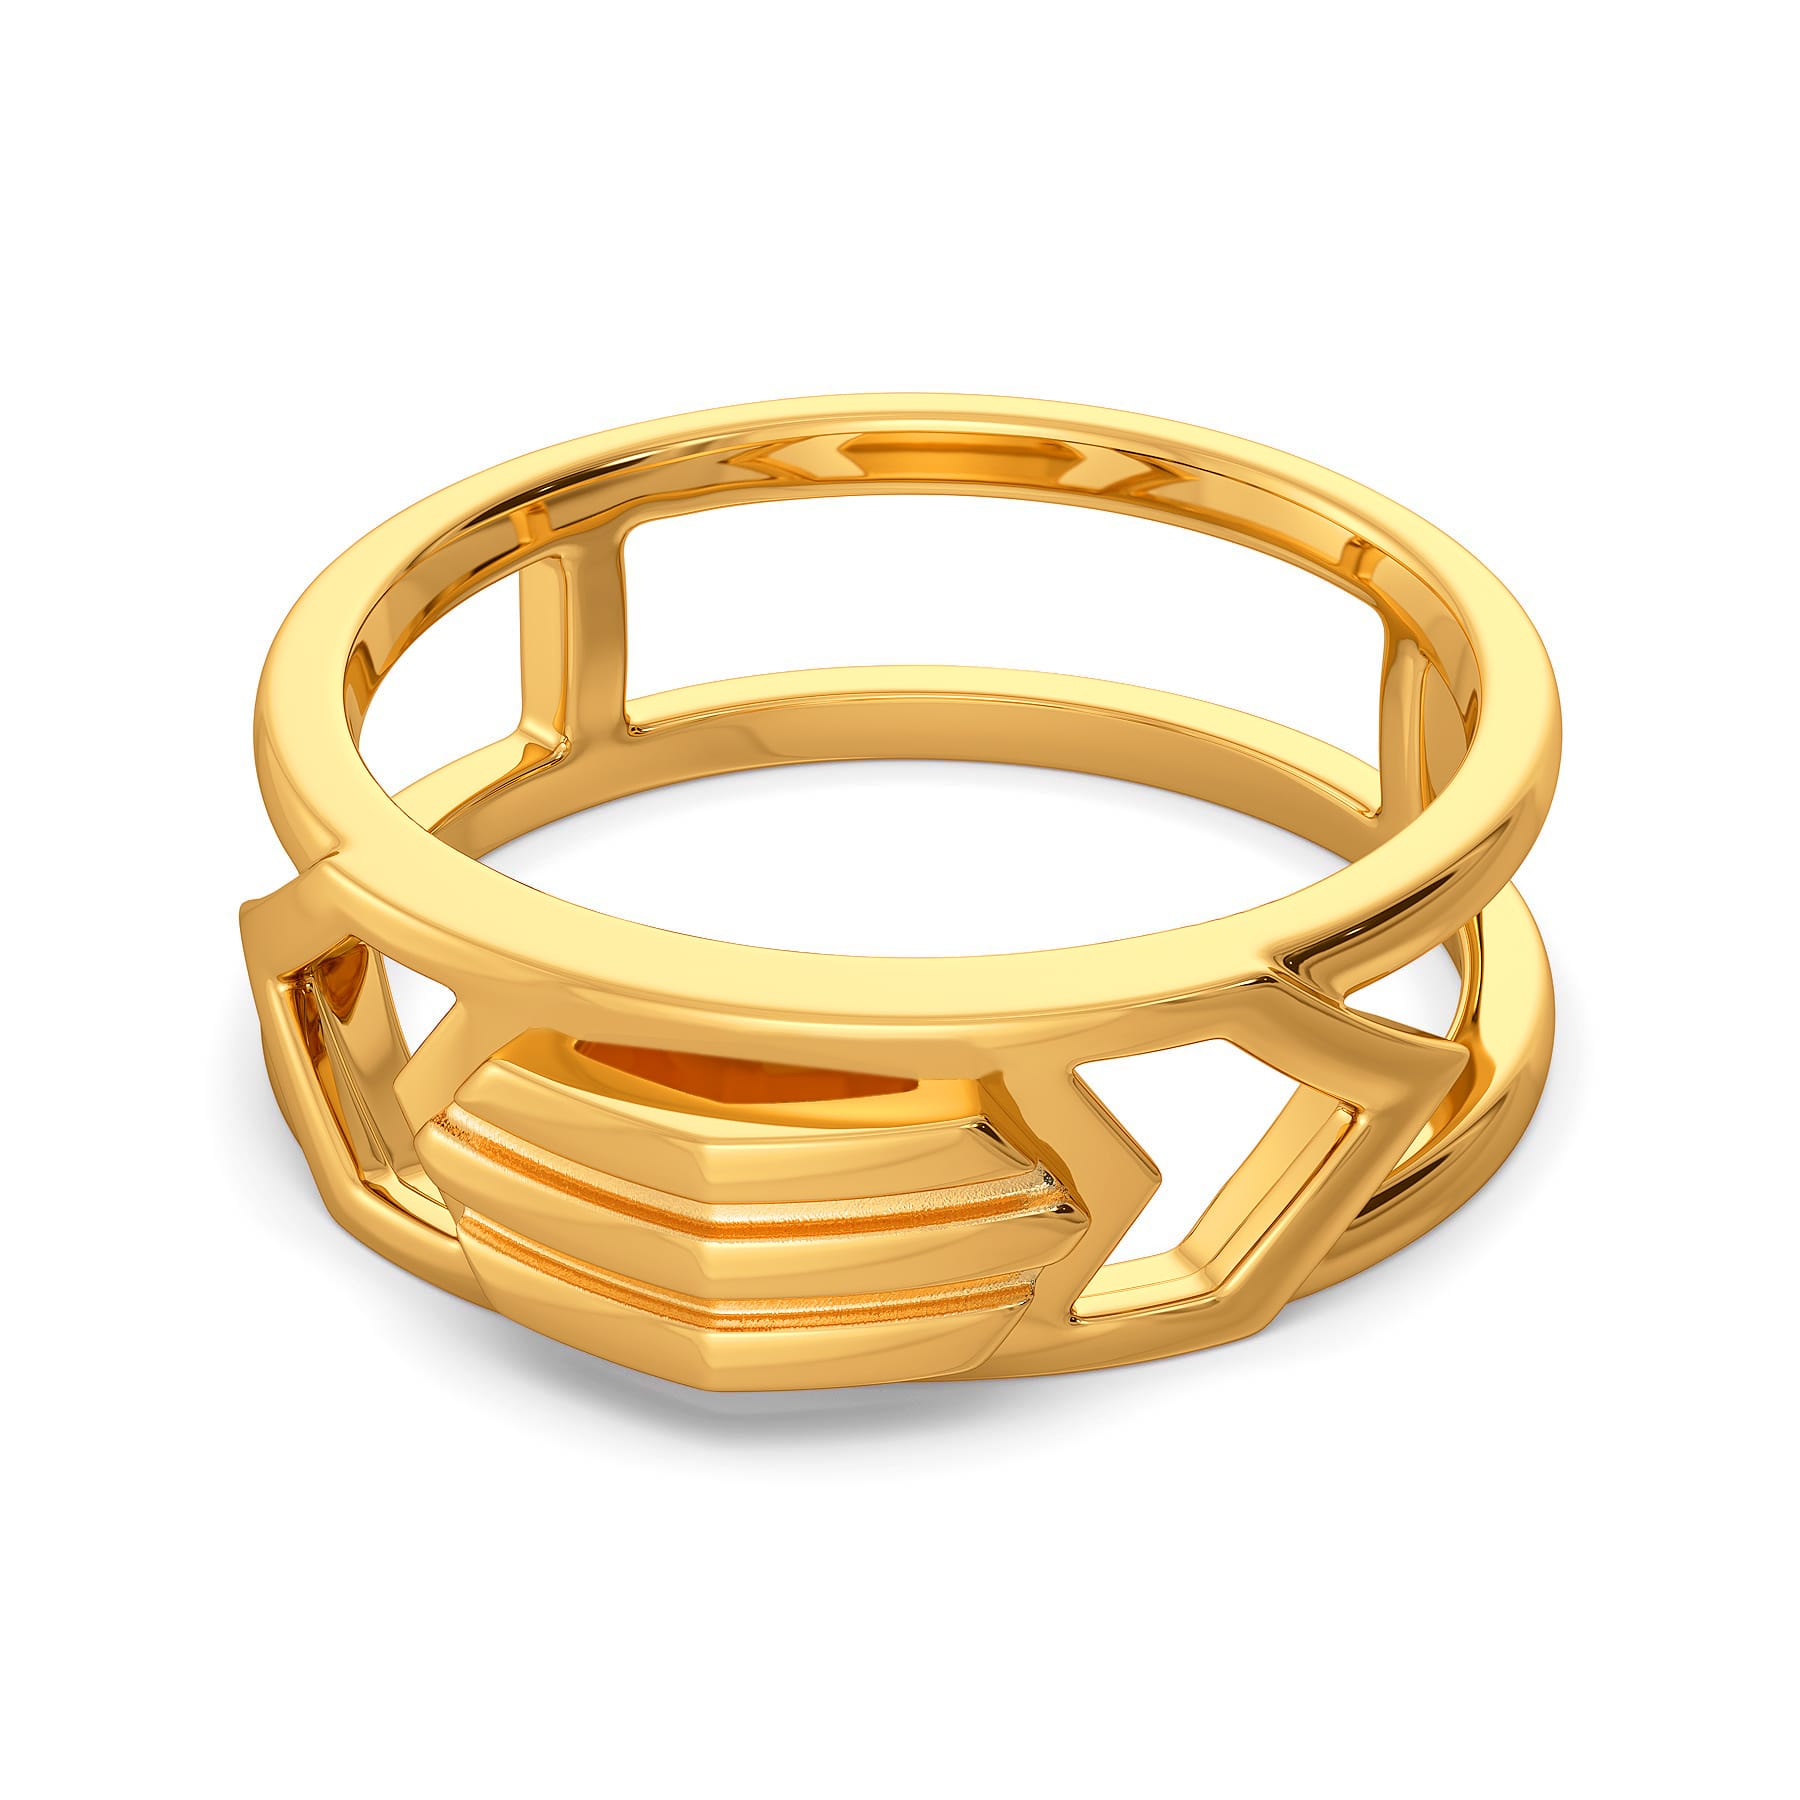 Gender Bender Gold Rings